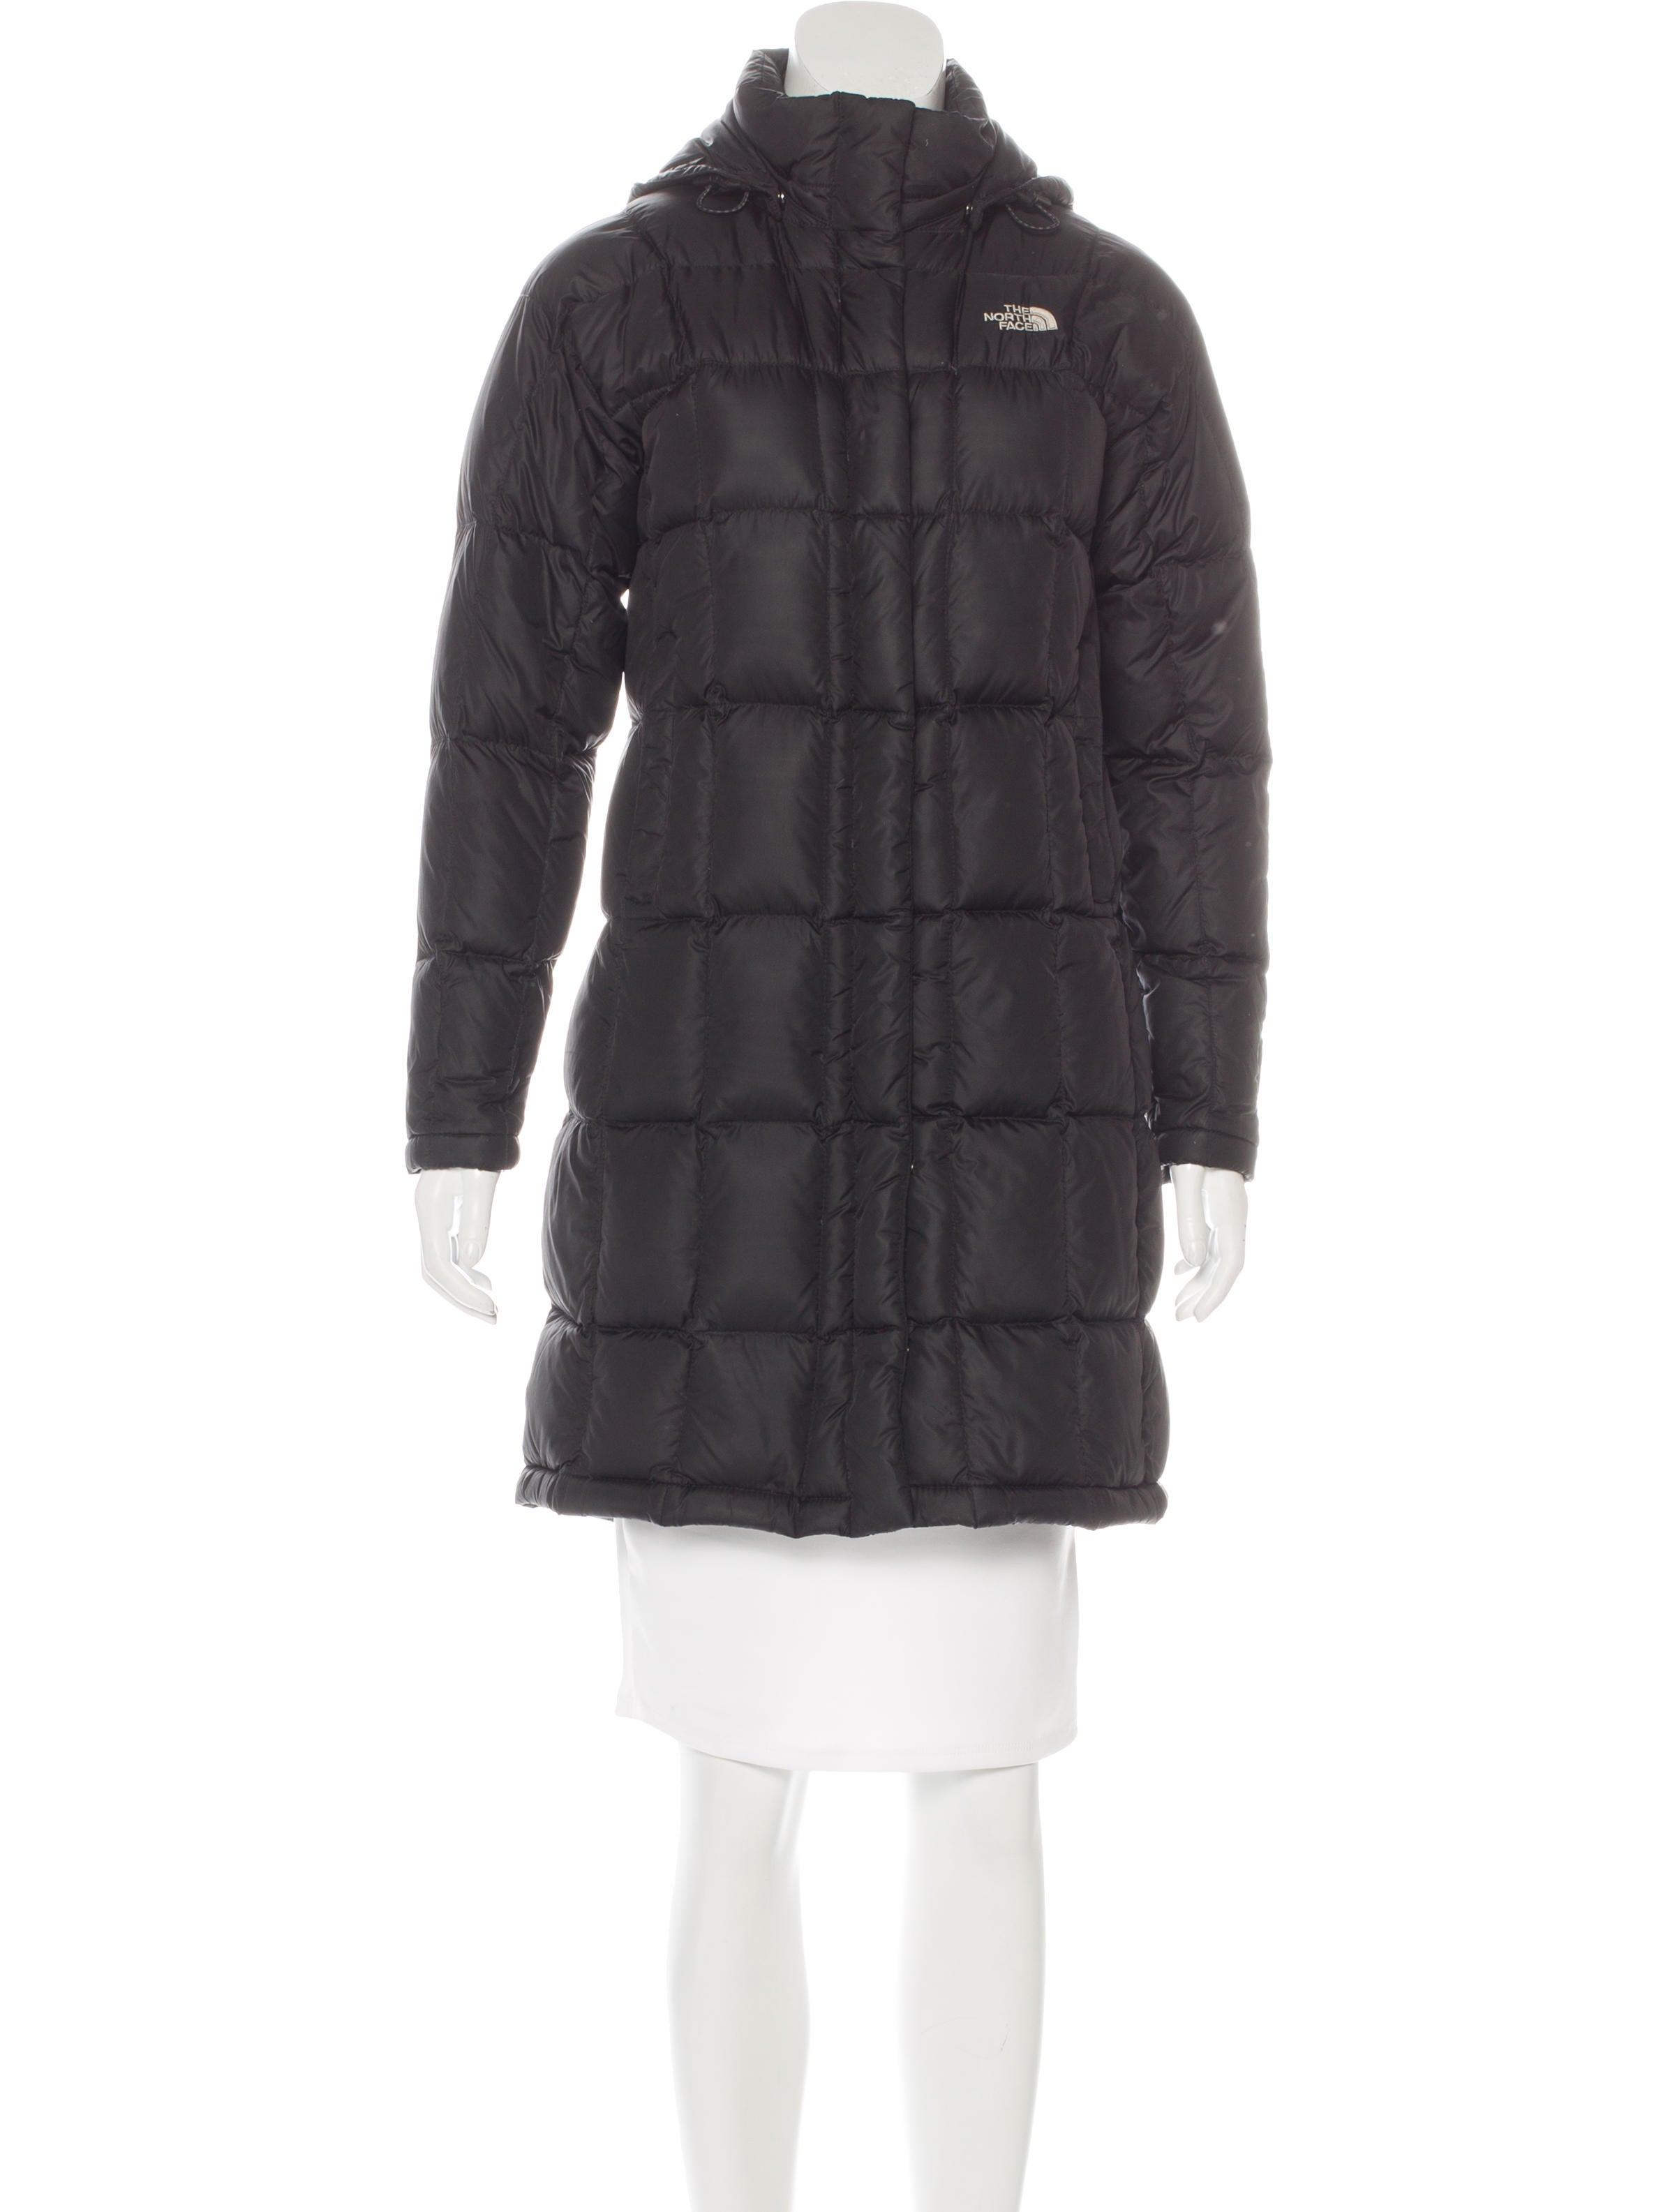 North face puffer jacket women